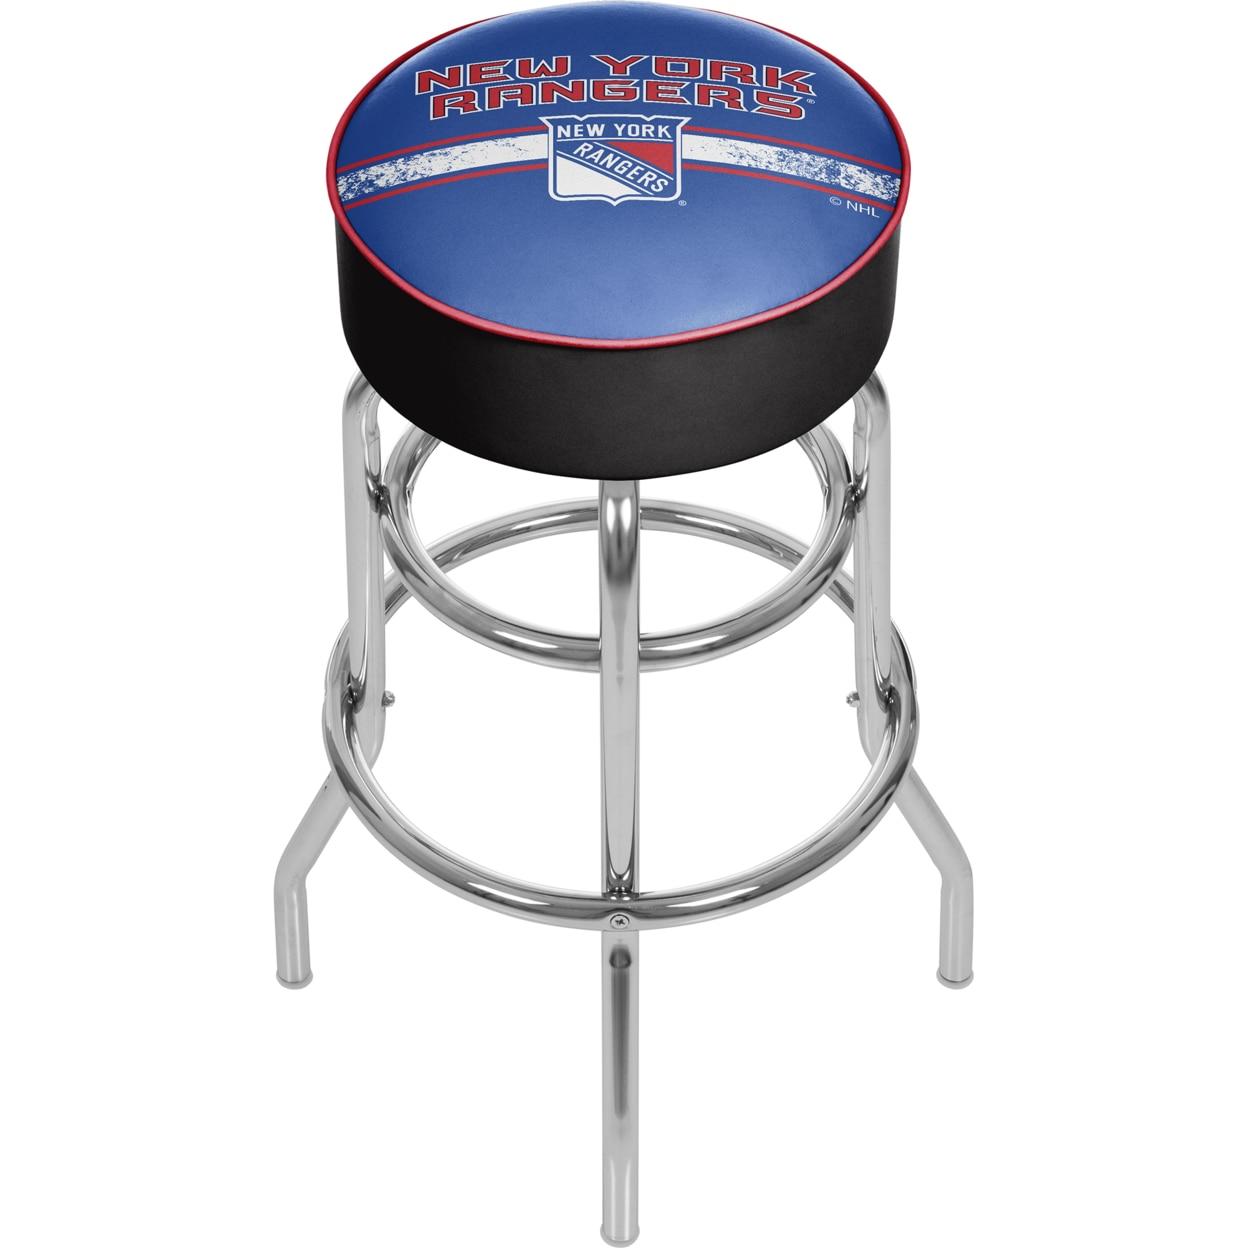 NHL Chrome 30 Inch Bar Stool with Swivel - New York Rangers купить nhl 10 на xbox